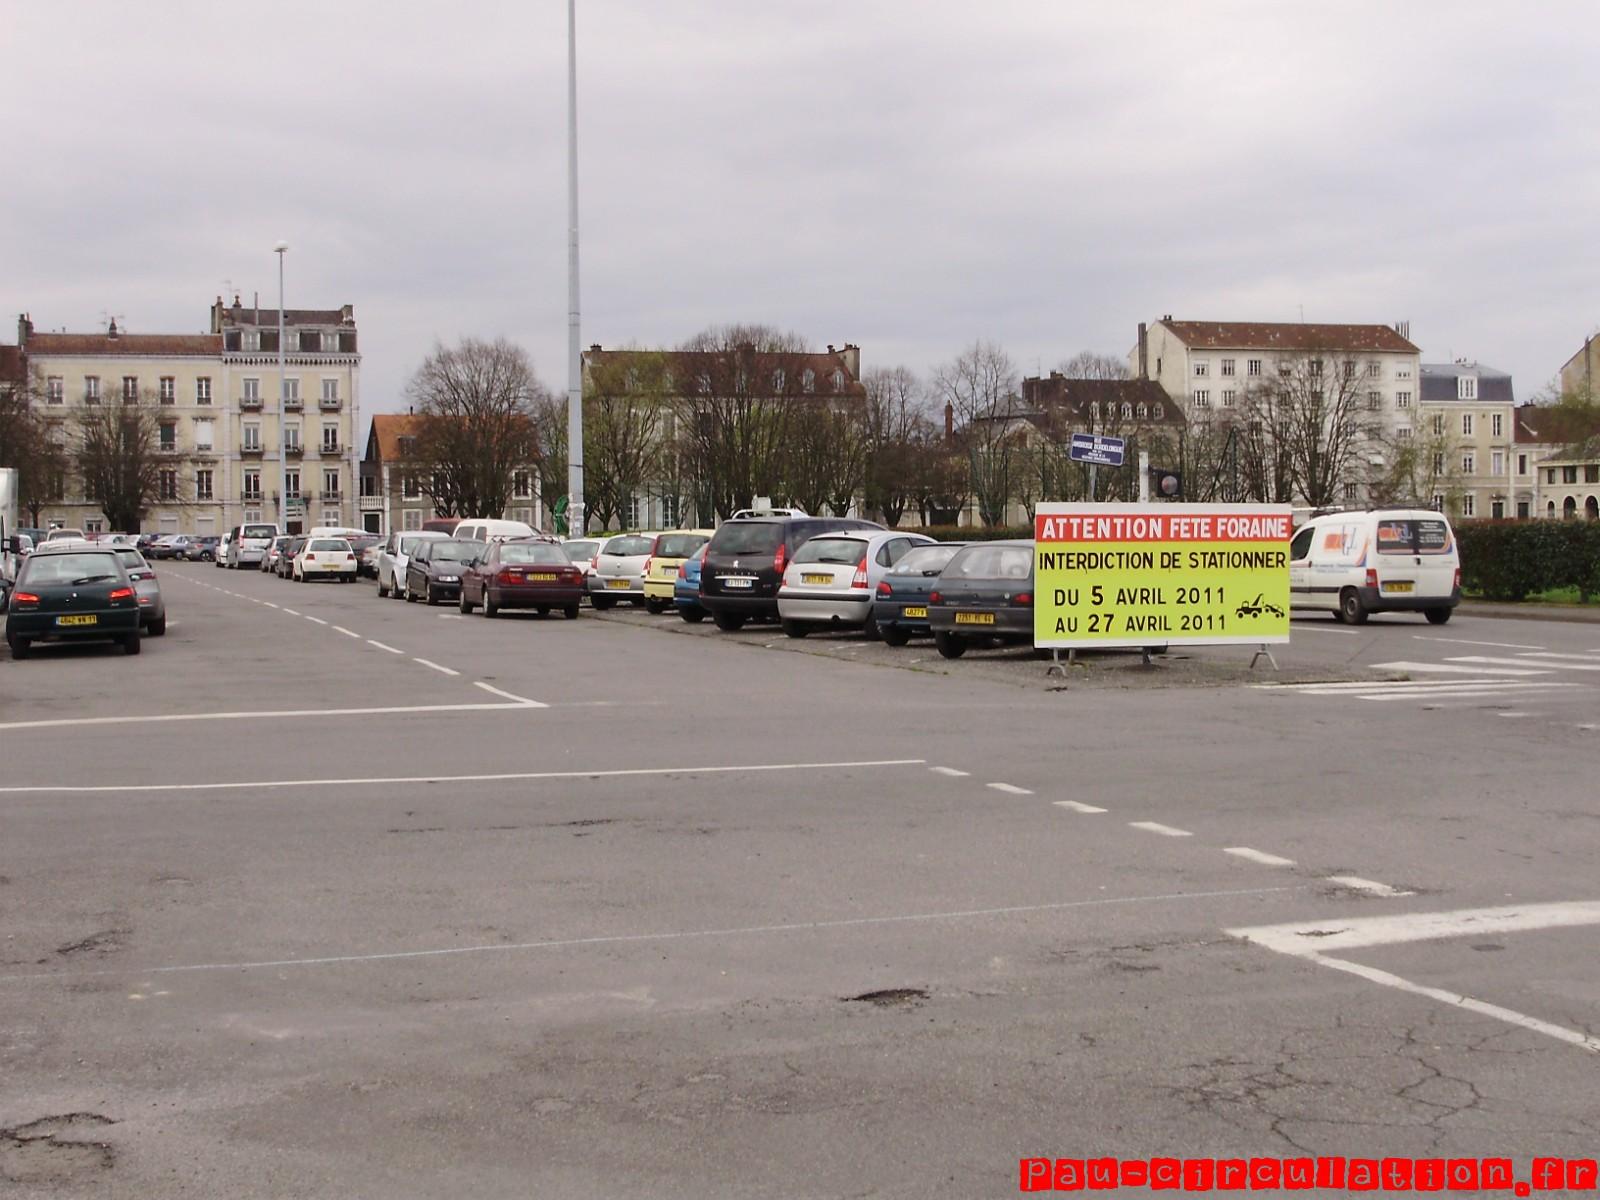 Fermeture de la Place de Verdun (Côté Sud)